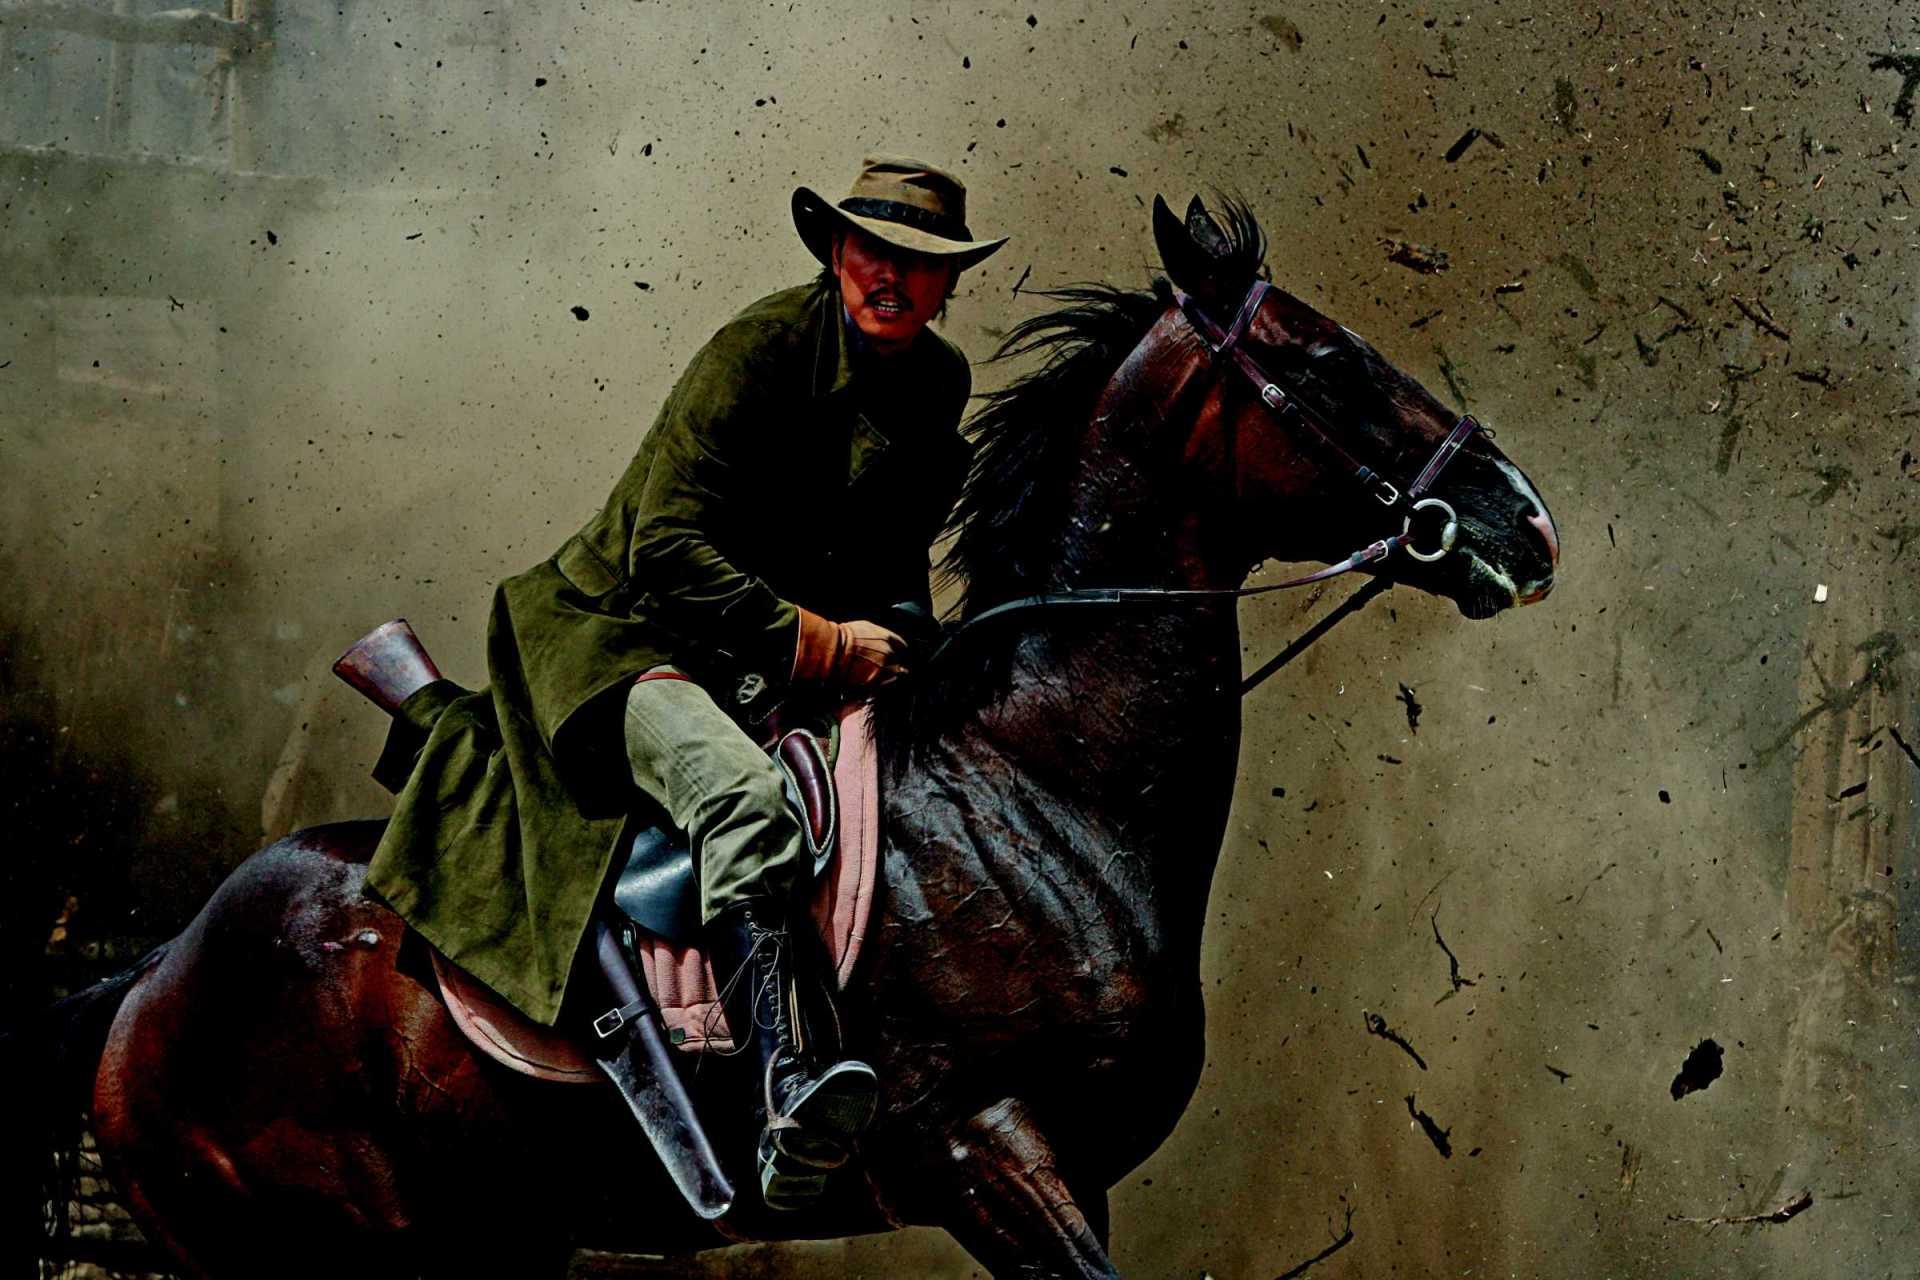 Western cowboys wallpaper - photo#23